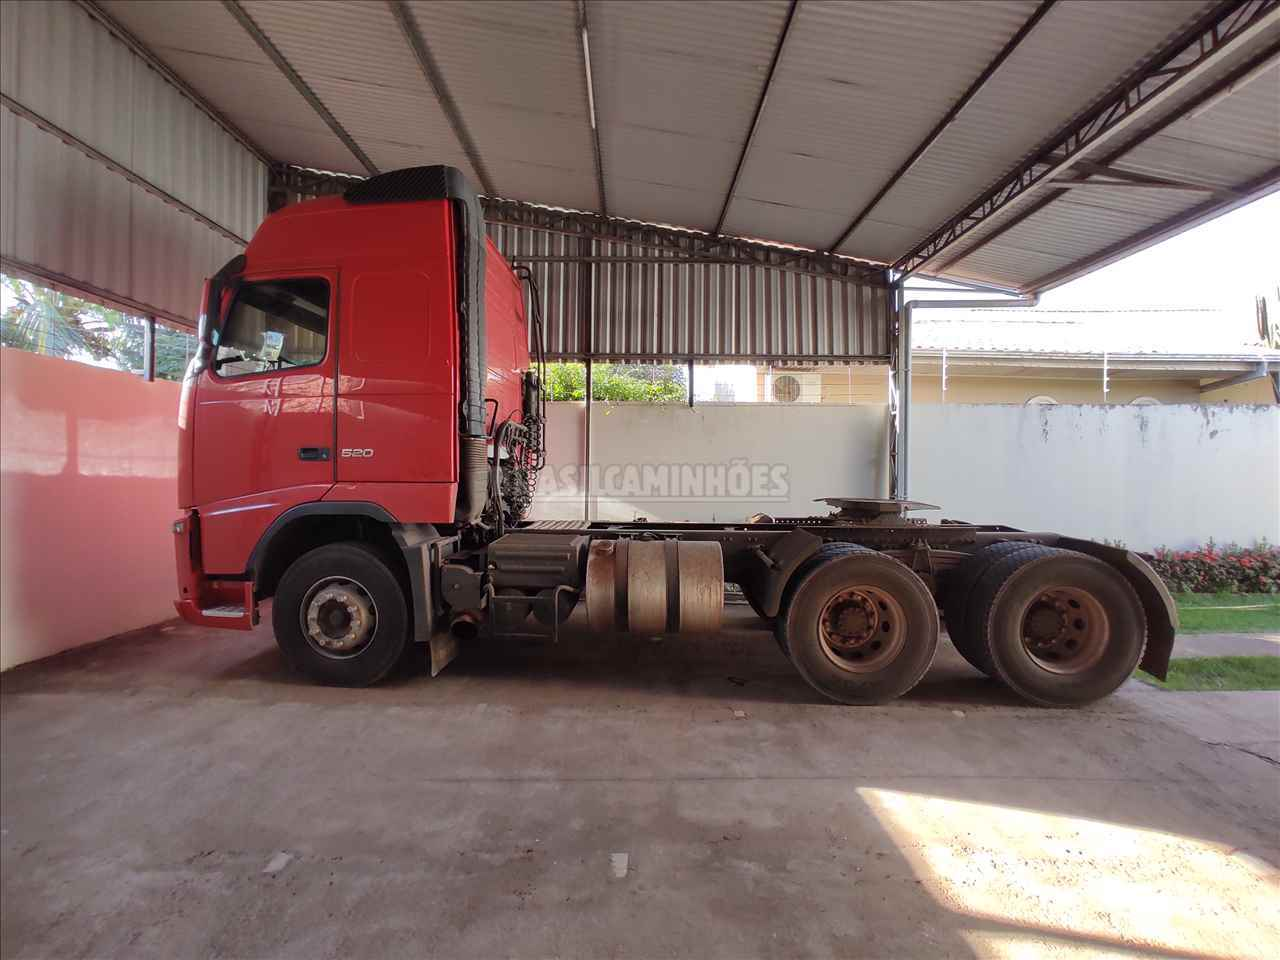 CAMINHAO VOLVO VOLVO FH 520 Cavalo Mecânico Traçado 6x4 Brasil Caminhões Sinop SINOP MATO GROSSO MT